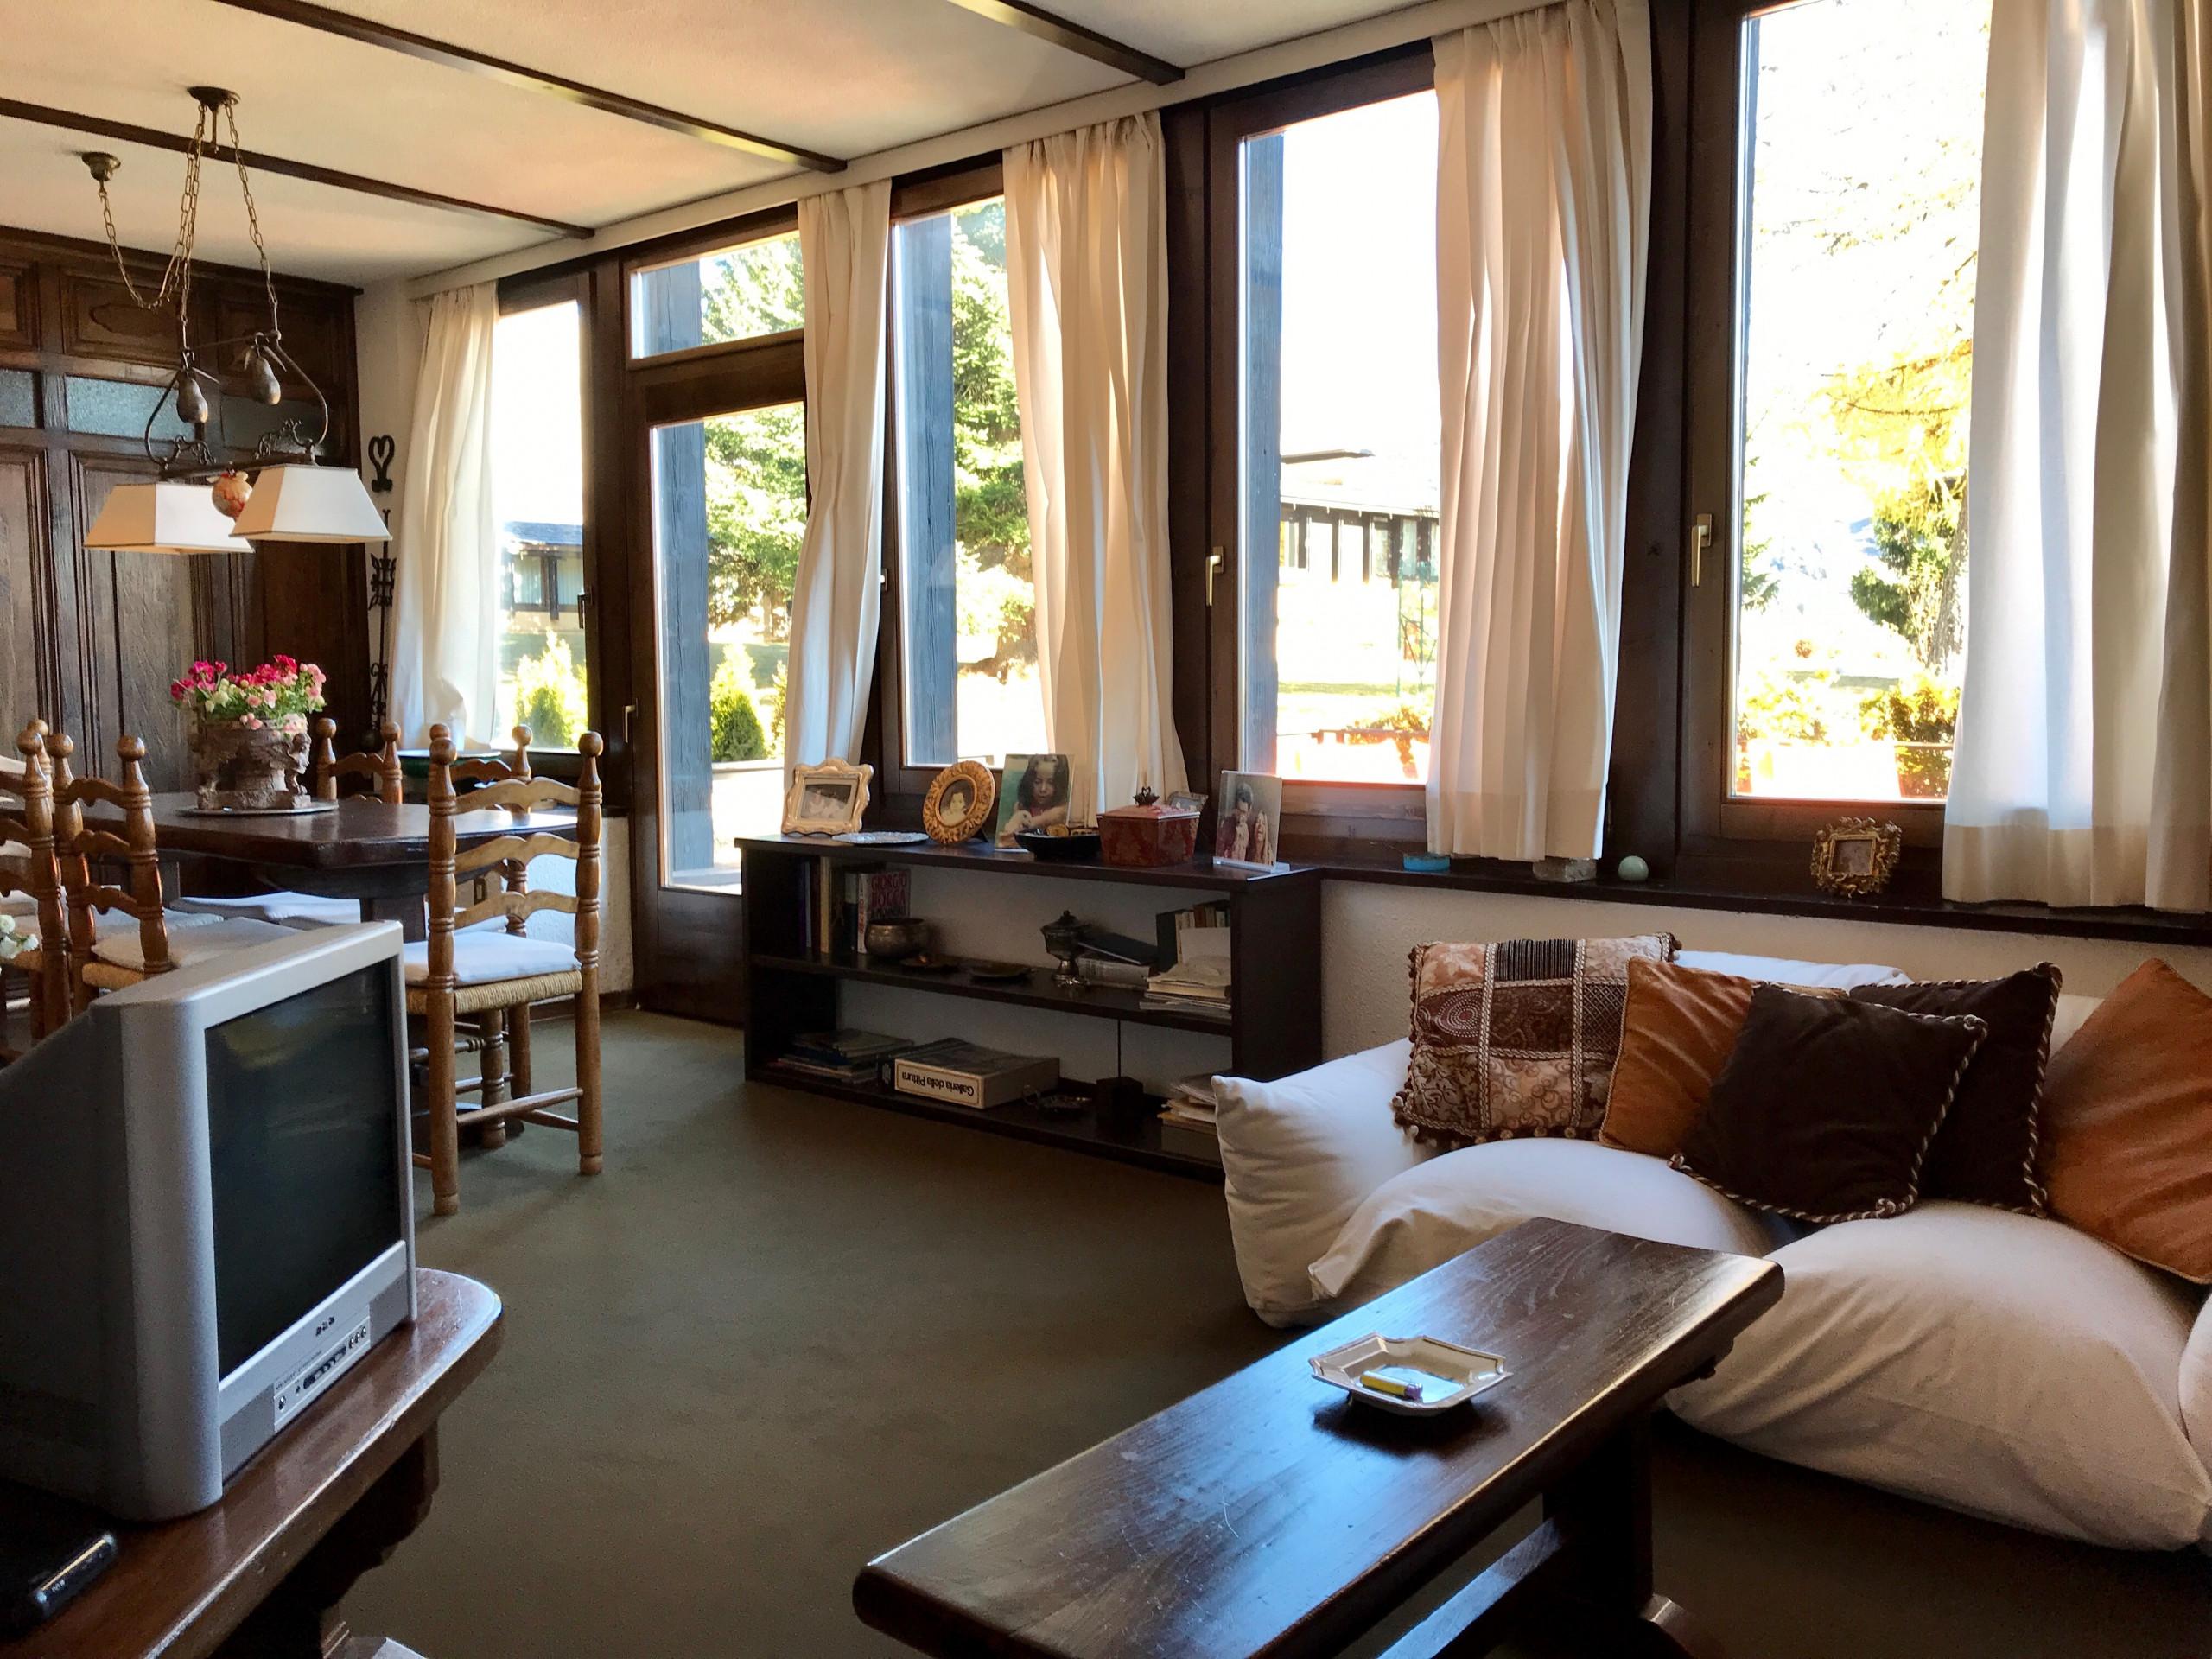 appartamenti in madonna di campiglio - patascoss trilocale